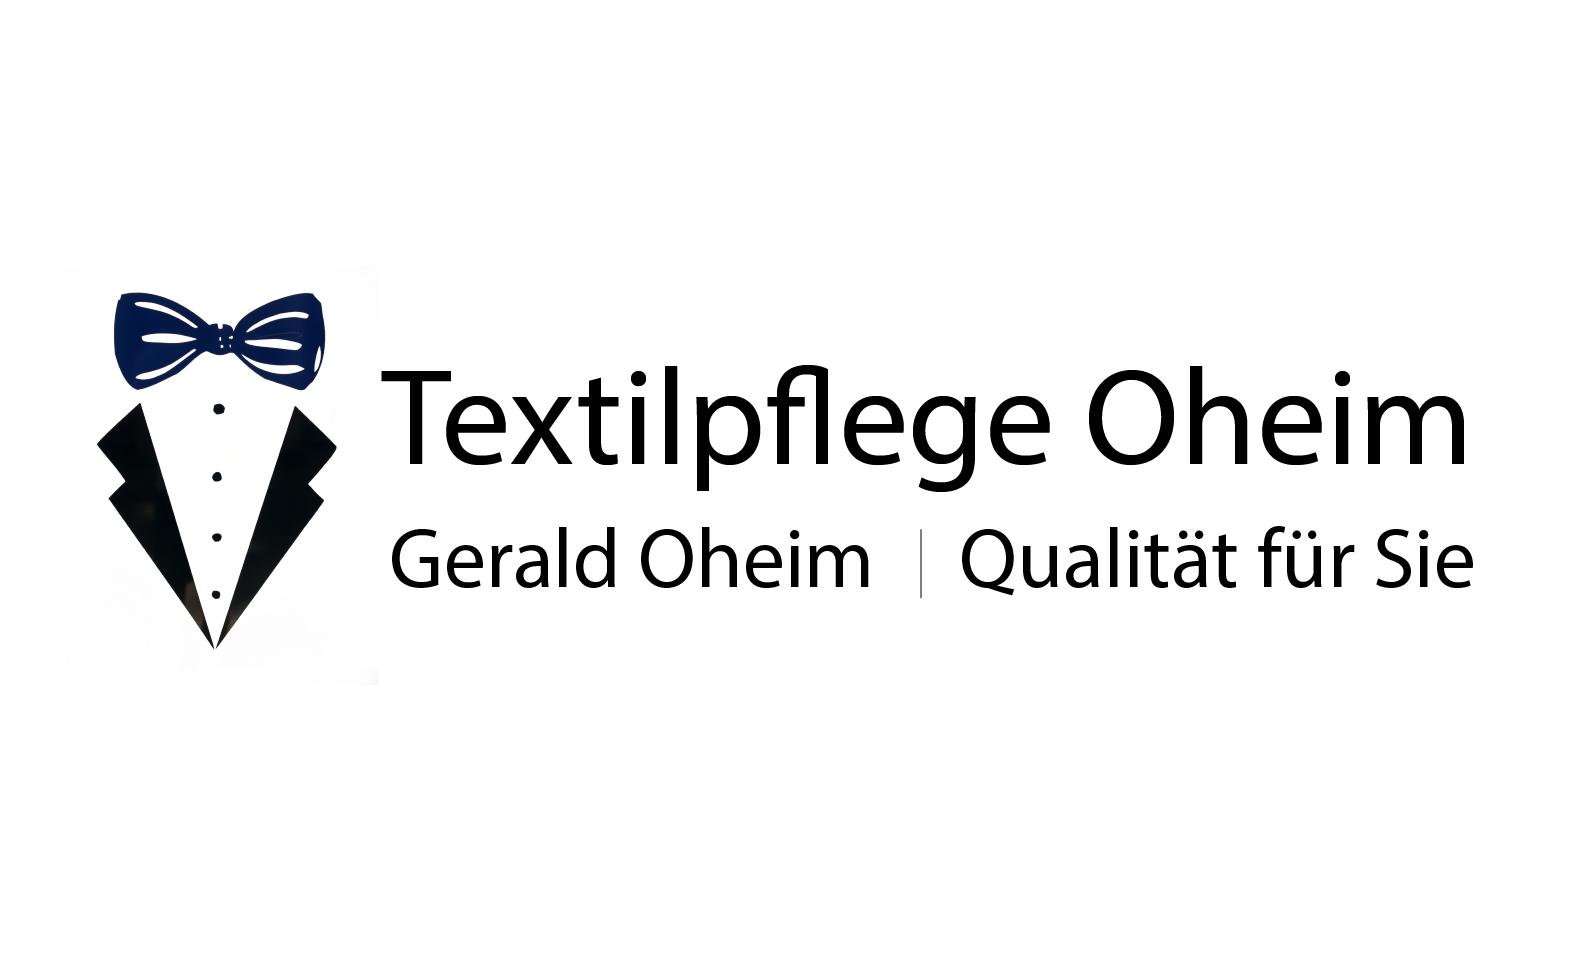 Textilpflege Gerald Oheim Berlin